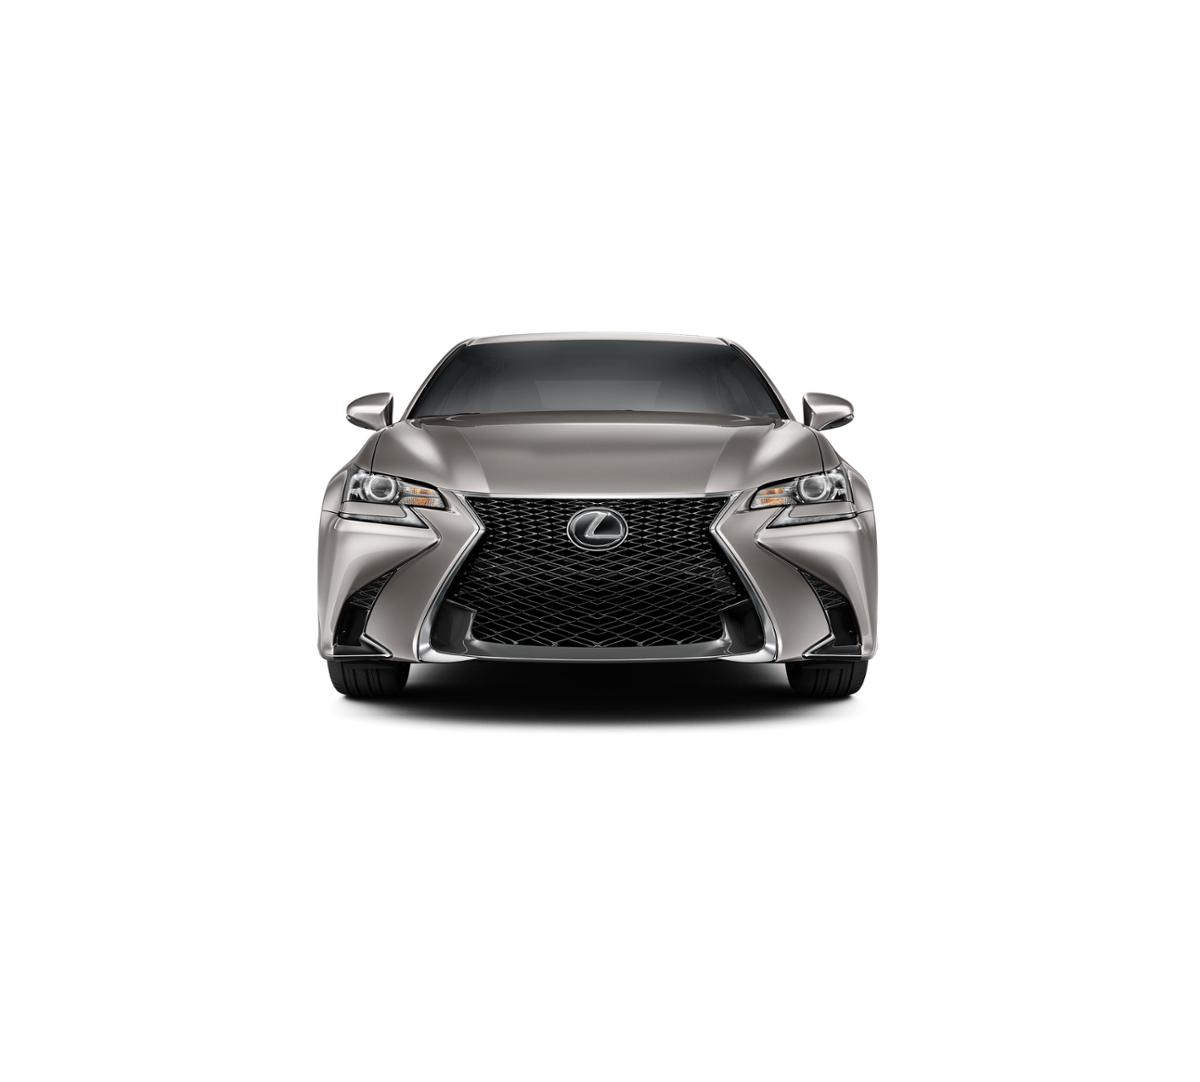 Lexus Gs For Sale: New Atomic Silver 2019 Lexus GS 350 F SPORT For Sale